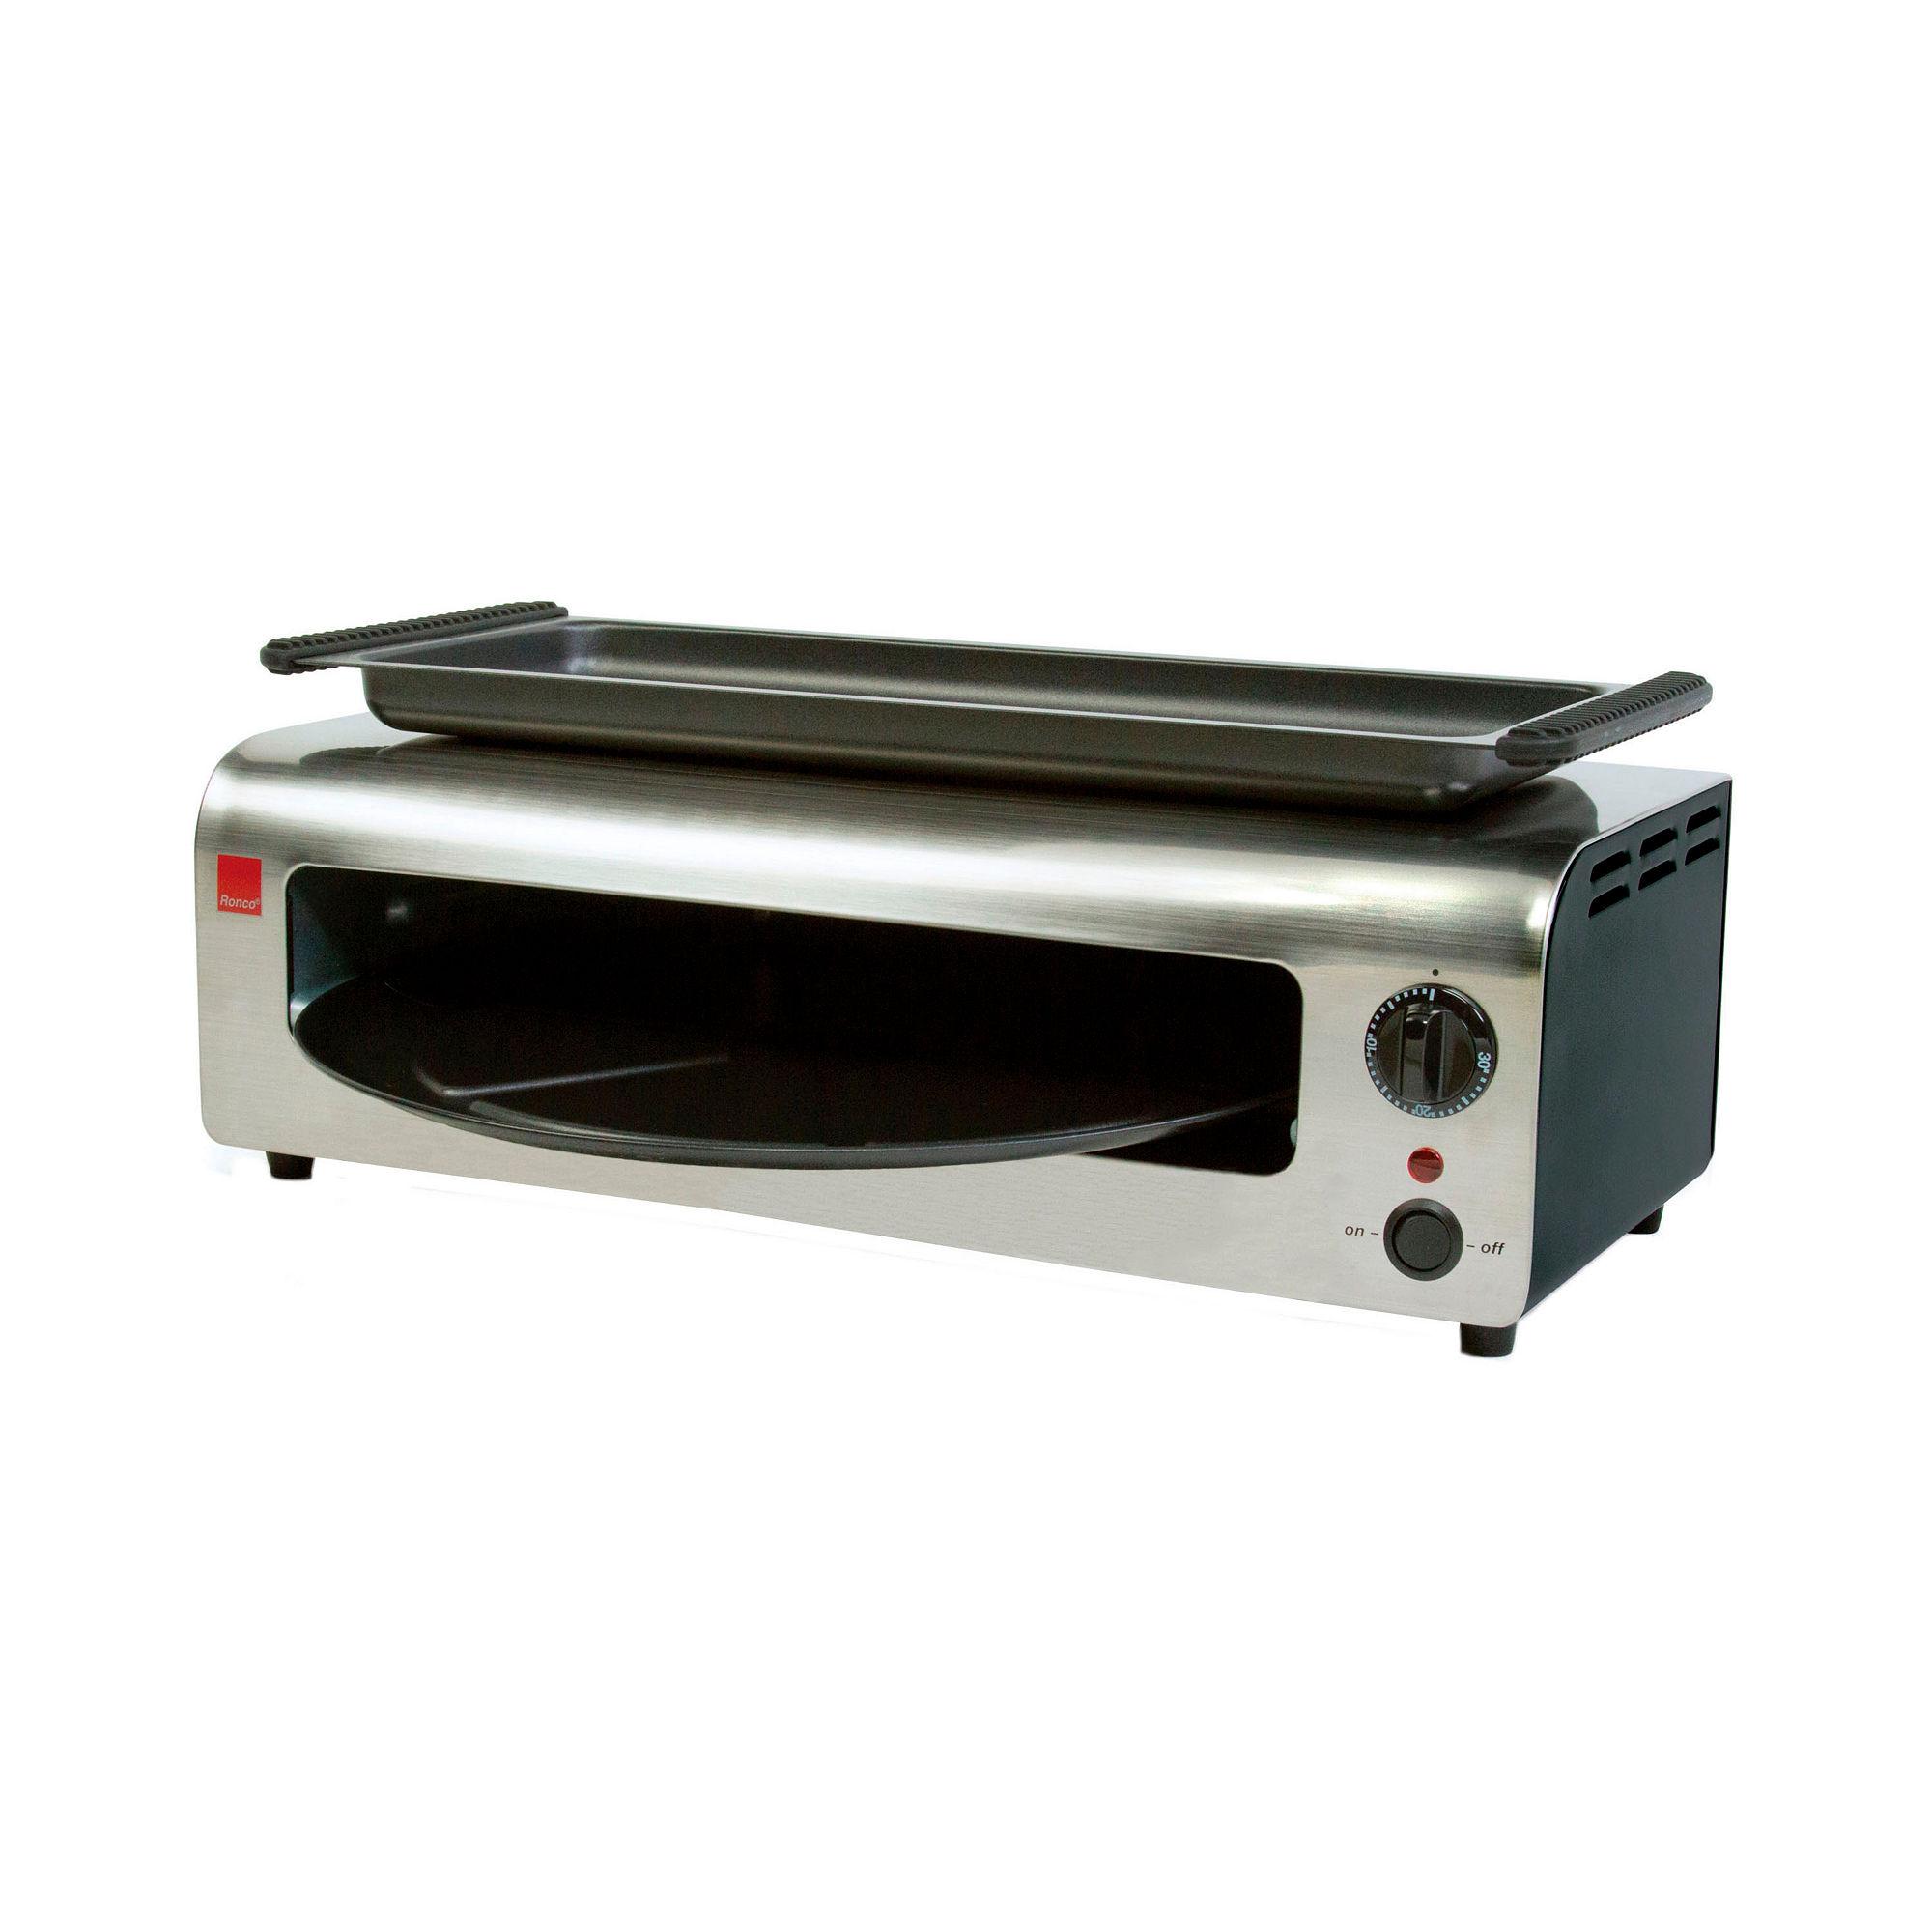 Ronco Pizza & MoreTM Oven